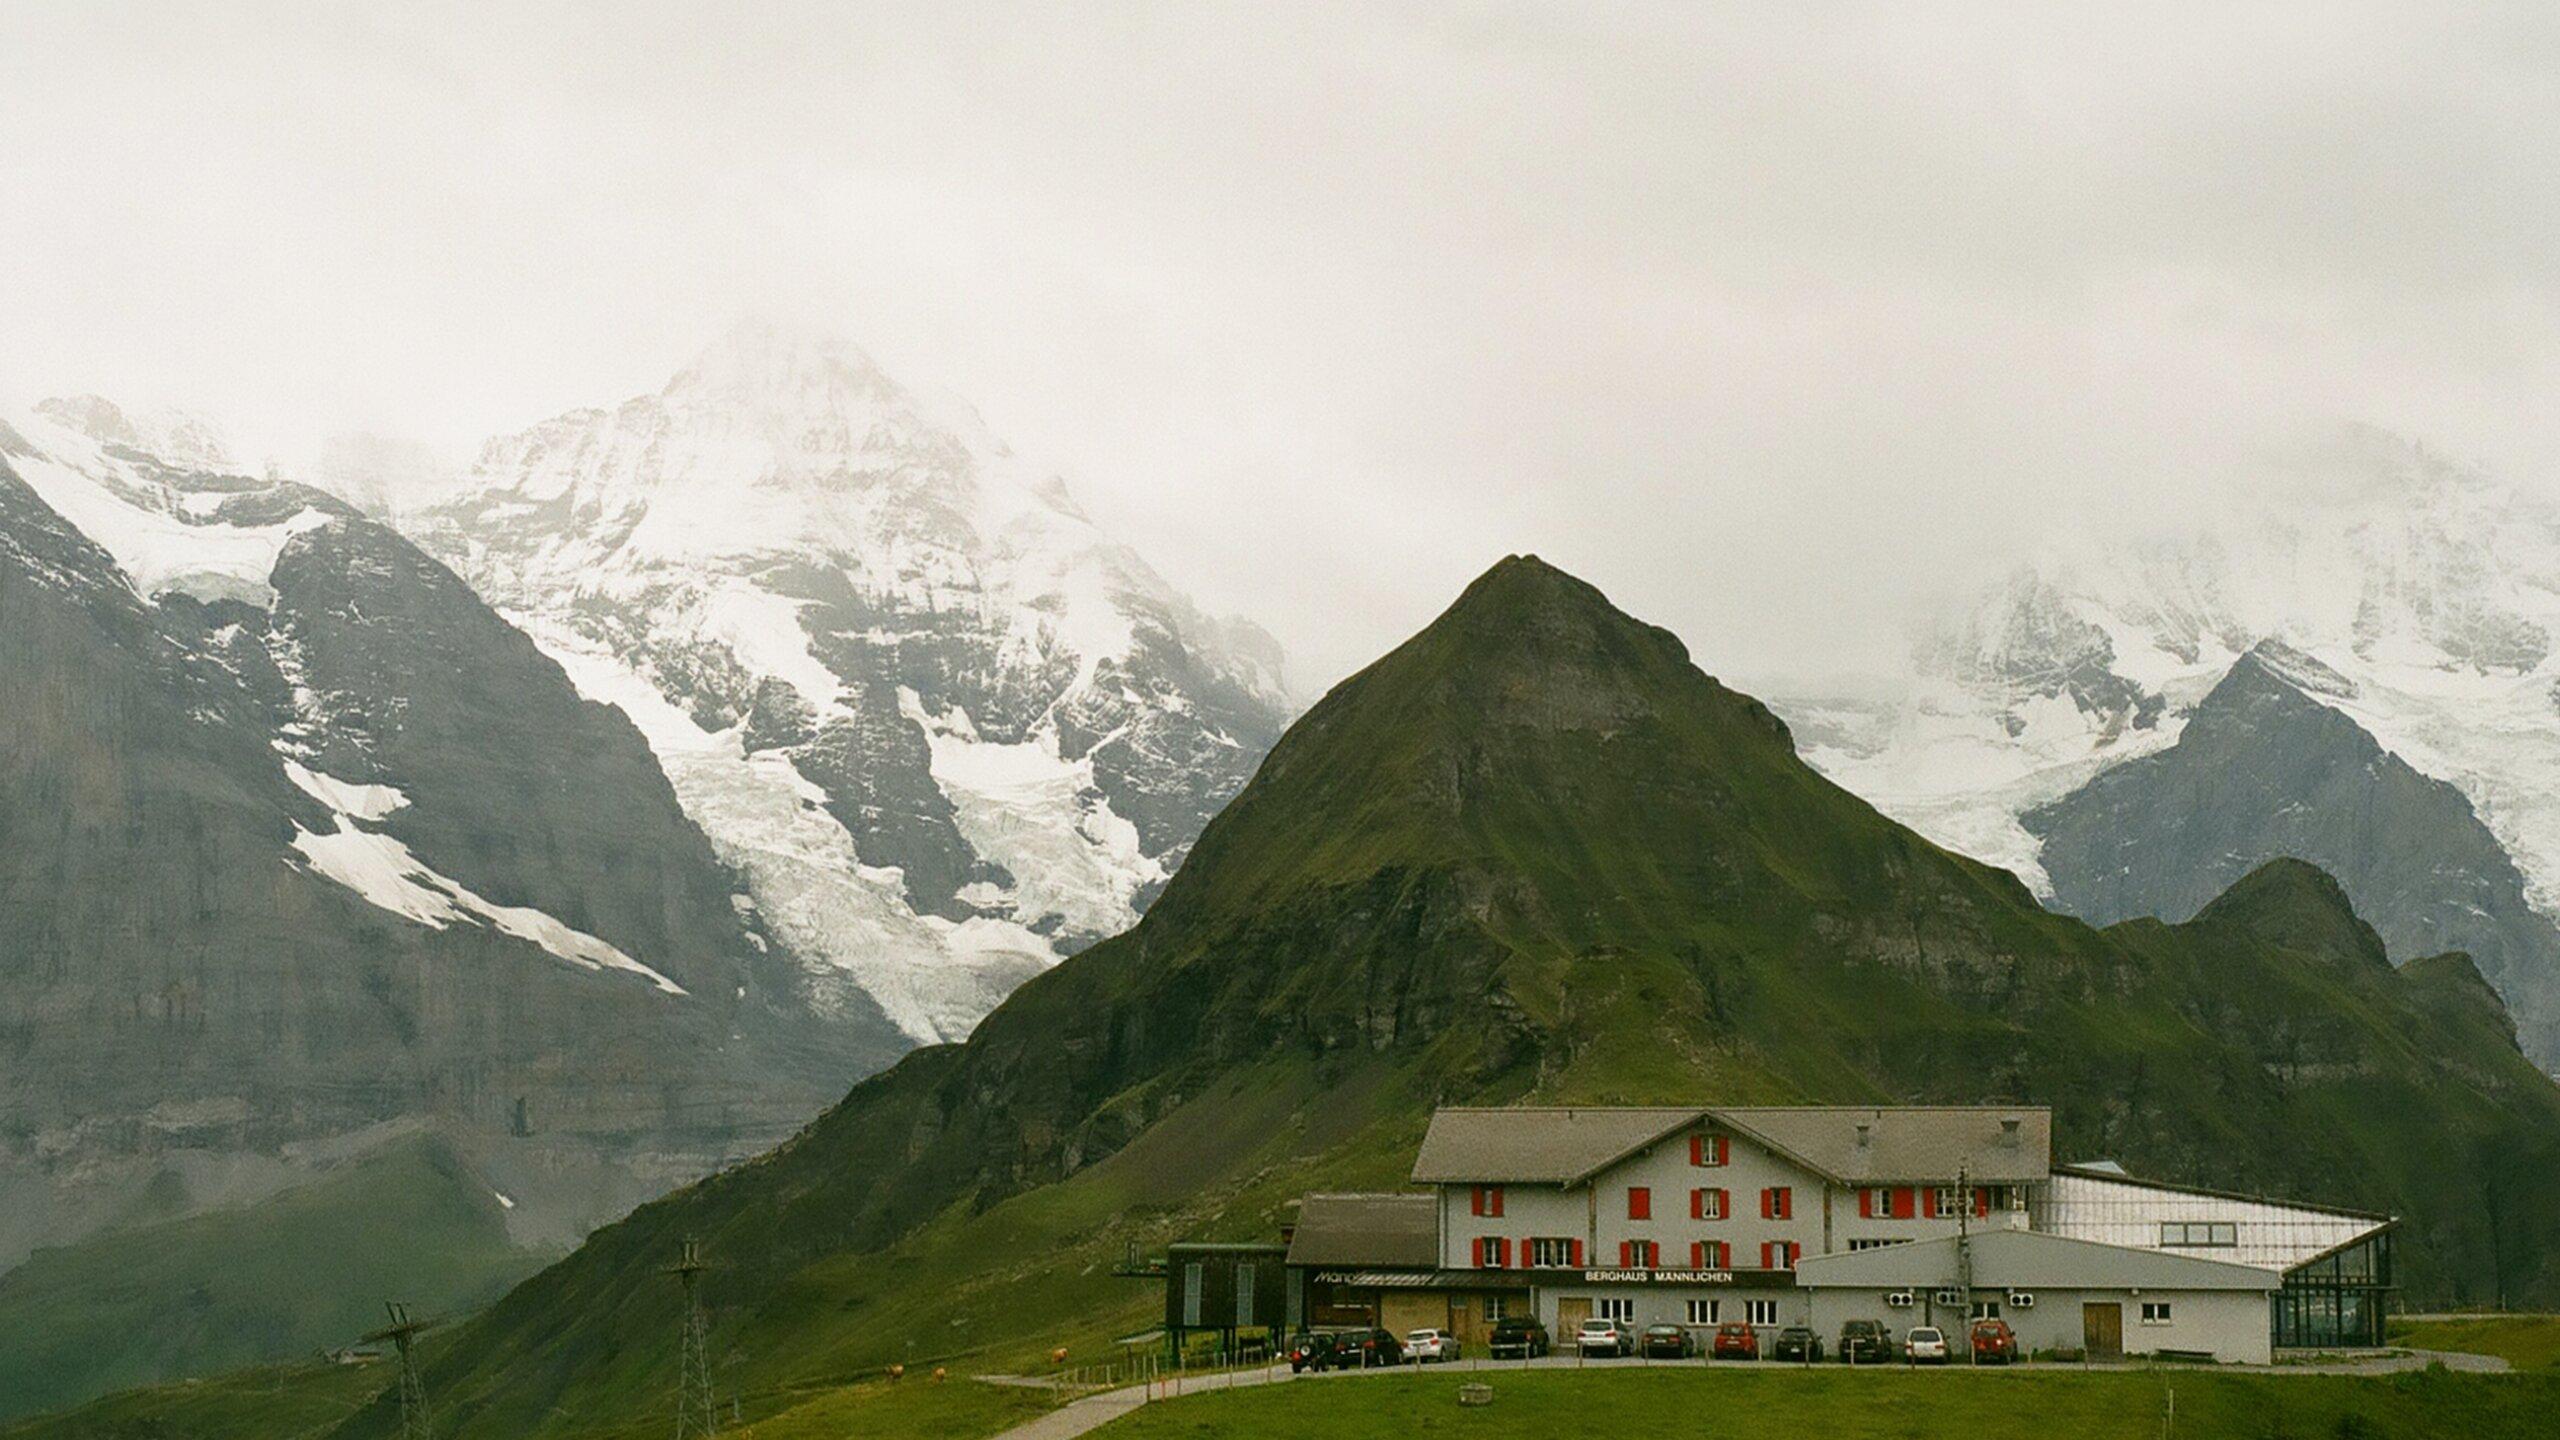 Top_9_Luxury_Resorts_for_a_Romantic_Honeymoon_in_Switzerland_TravellersofIndia